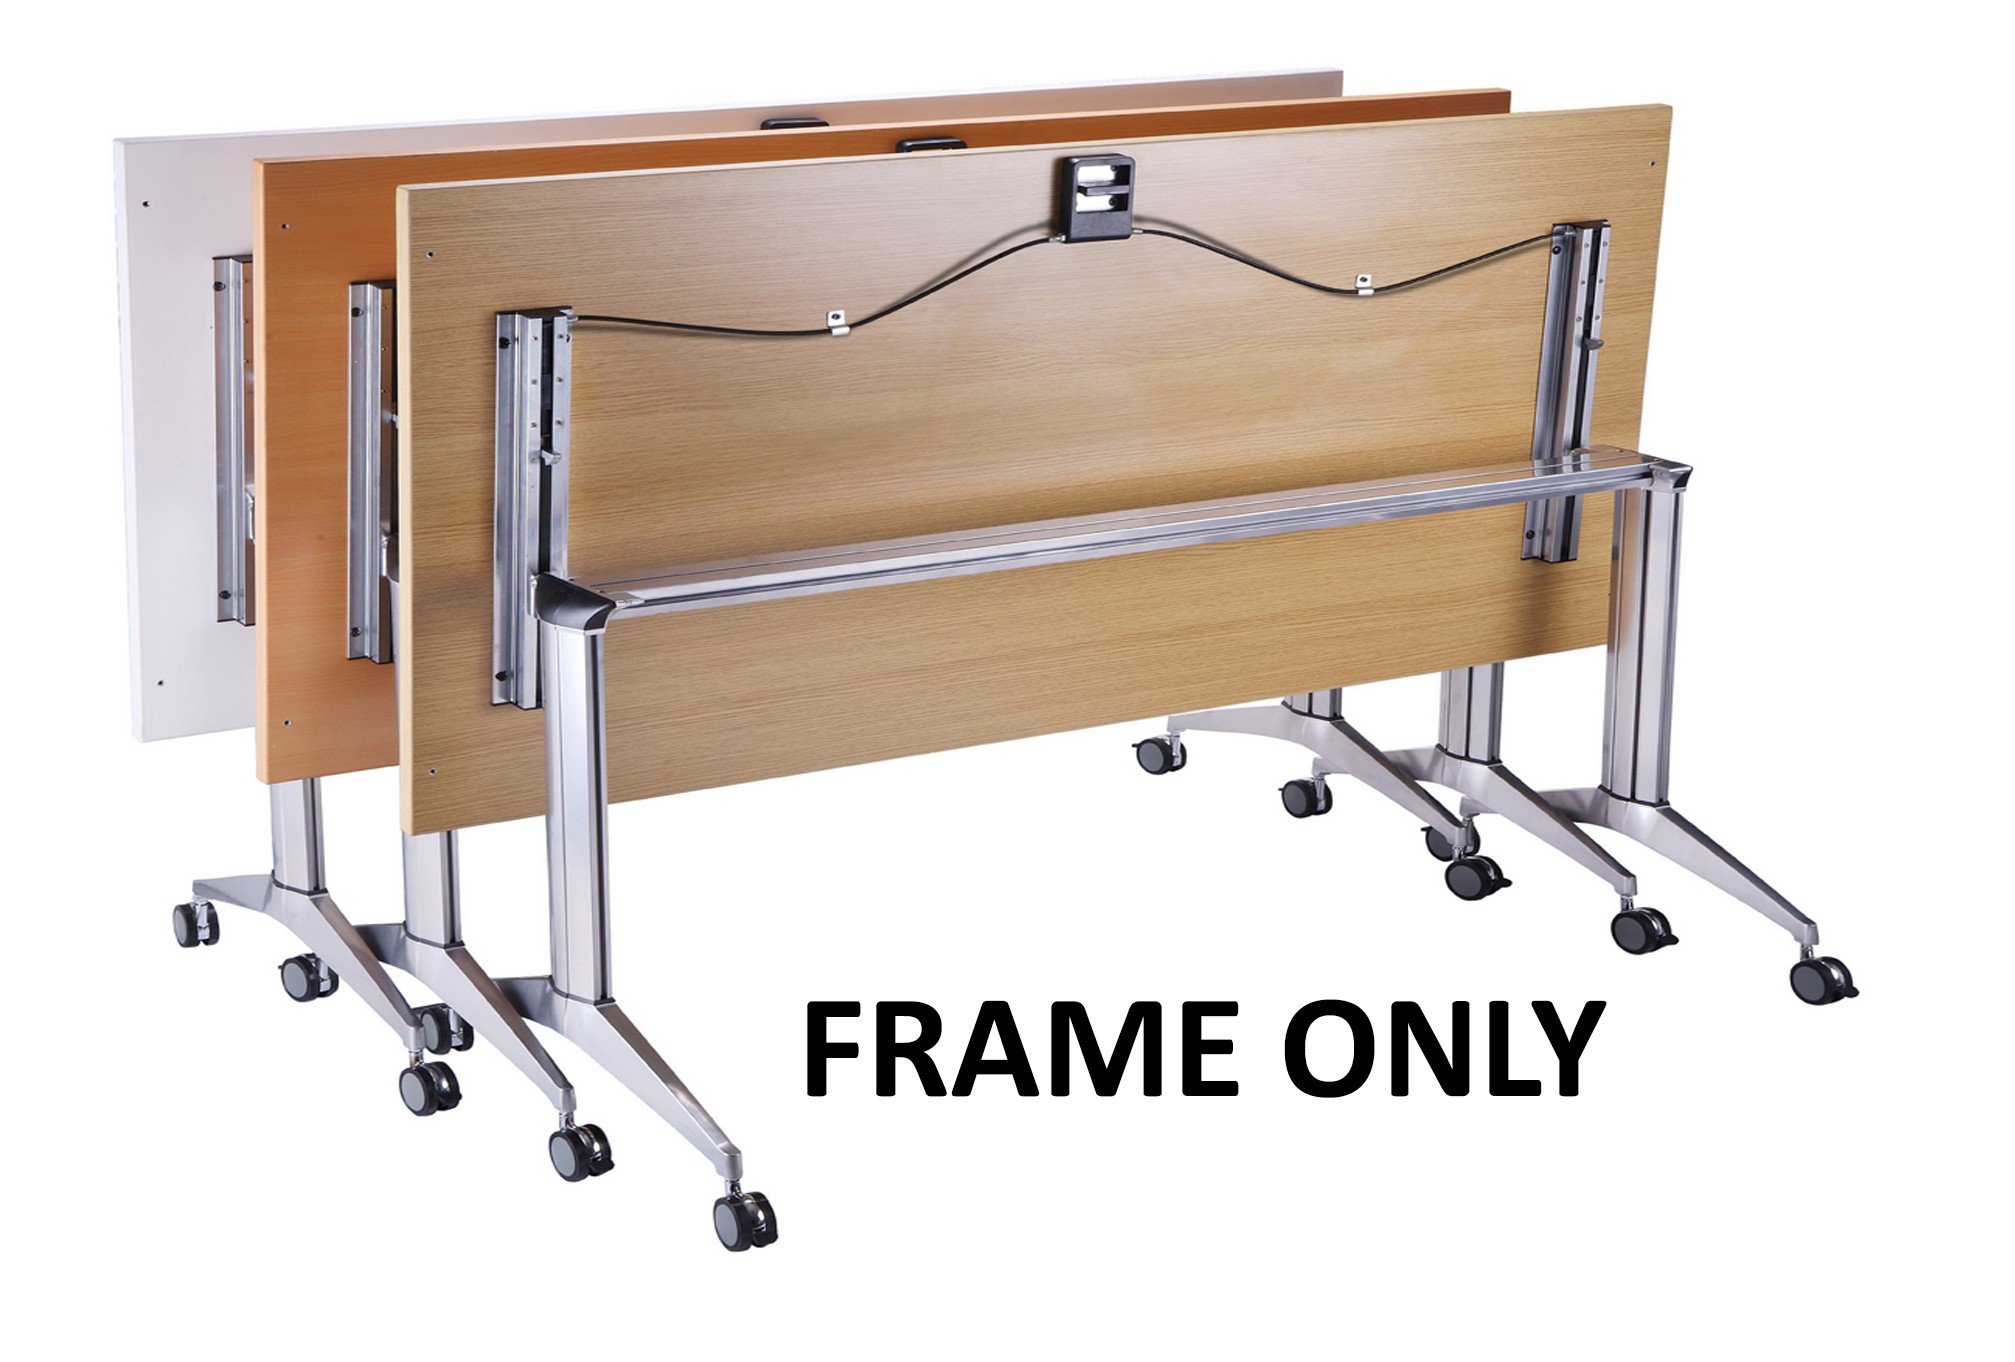 Fliptop Table Frame (WxDxH) 1120x585x725mm